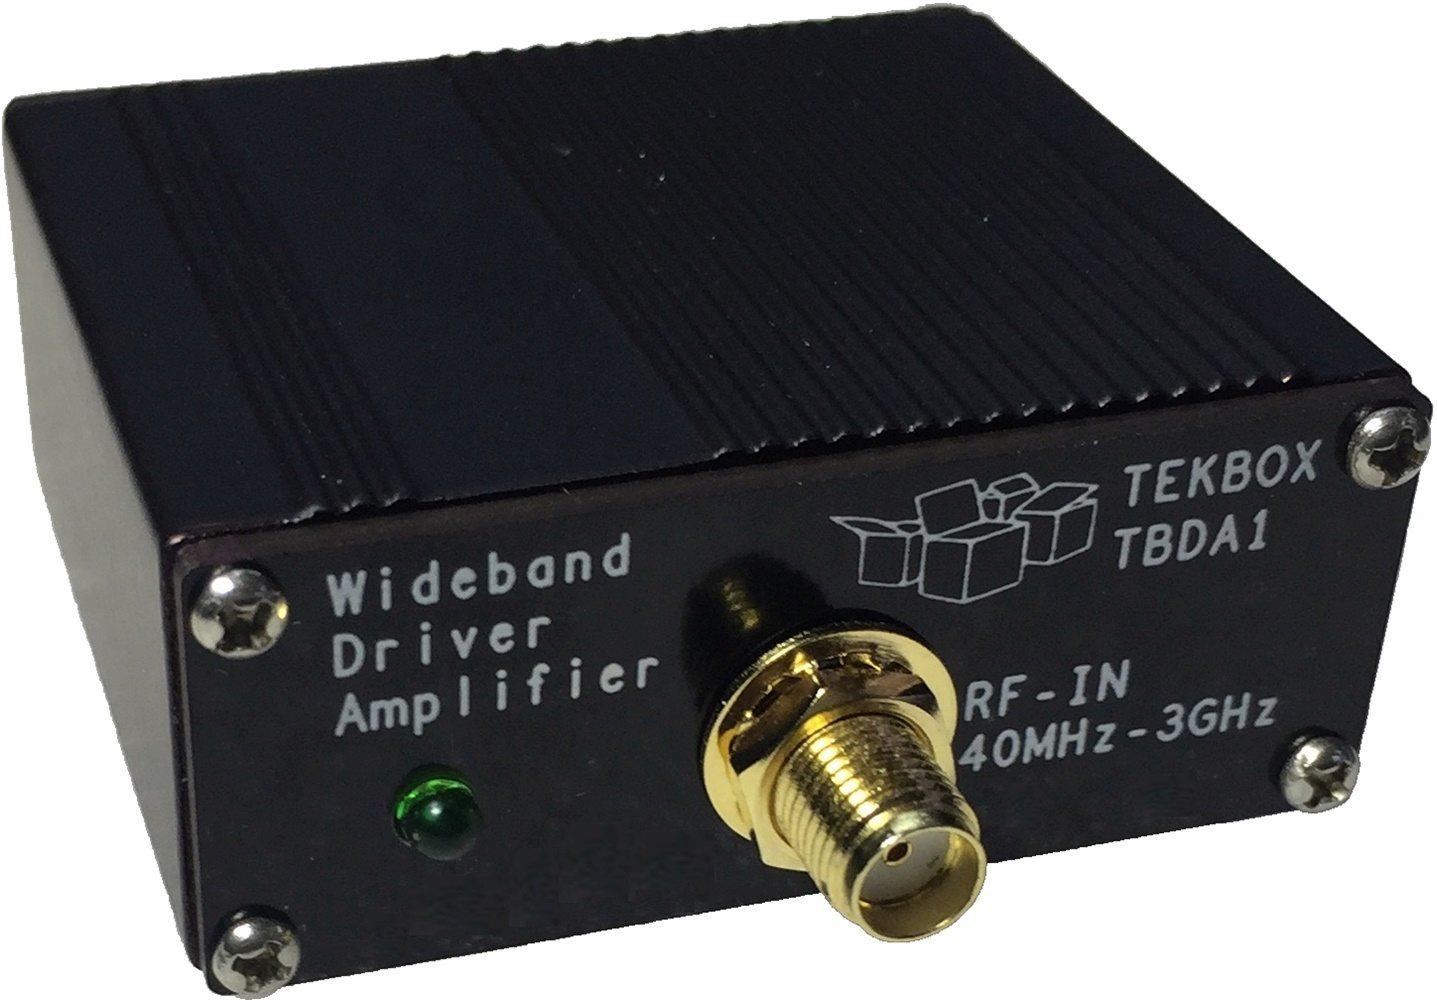 Tekbox Leistungsverstrker Tbda1 28 40 Mhz Wideband Rf Amplifier